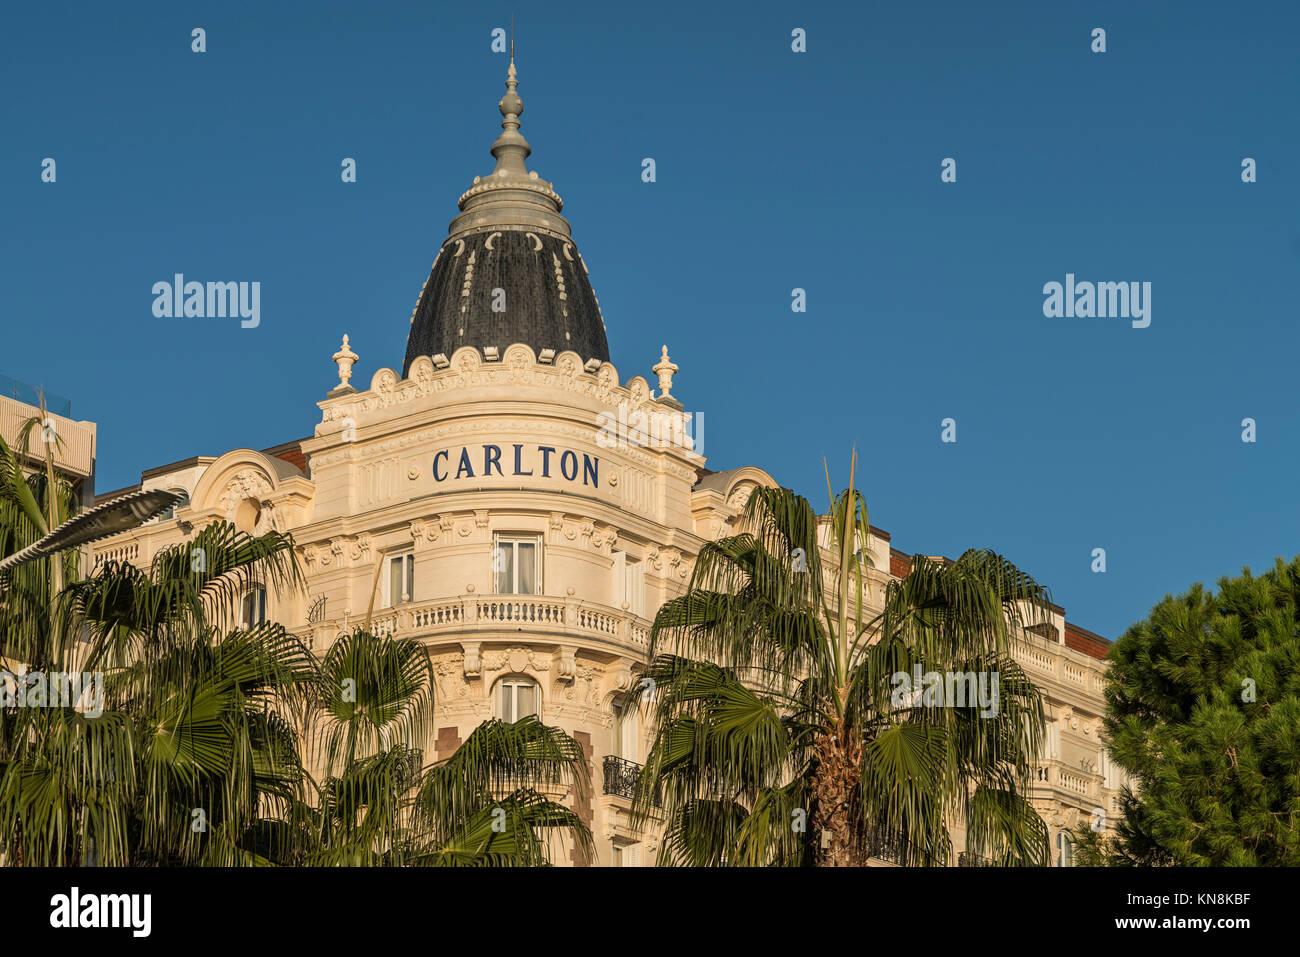 Carlton Hotel, Cannes, Alpes Maritimes, Cote D'Azur, Provence, Frankreich Stockbild